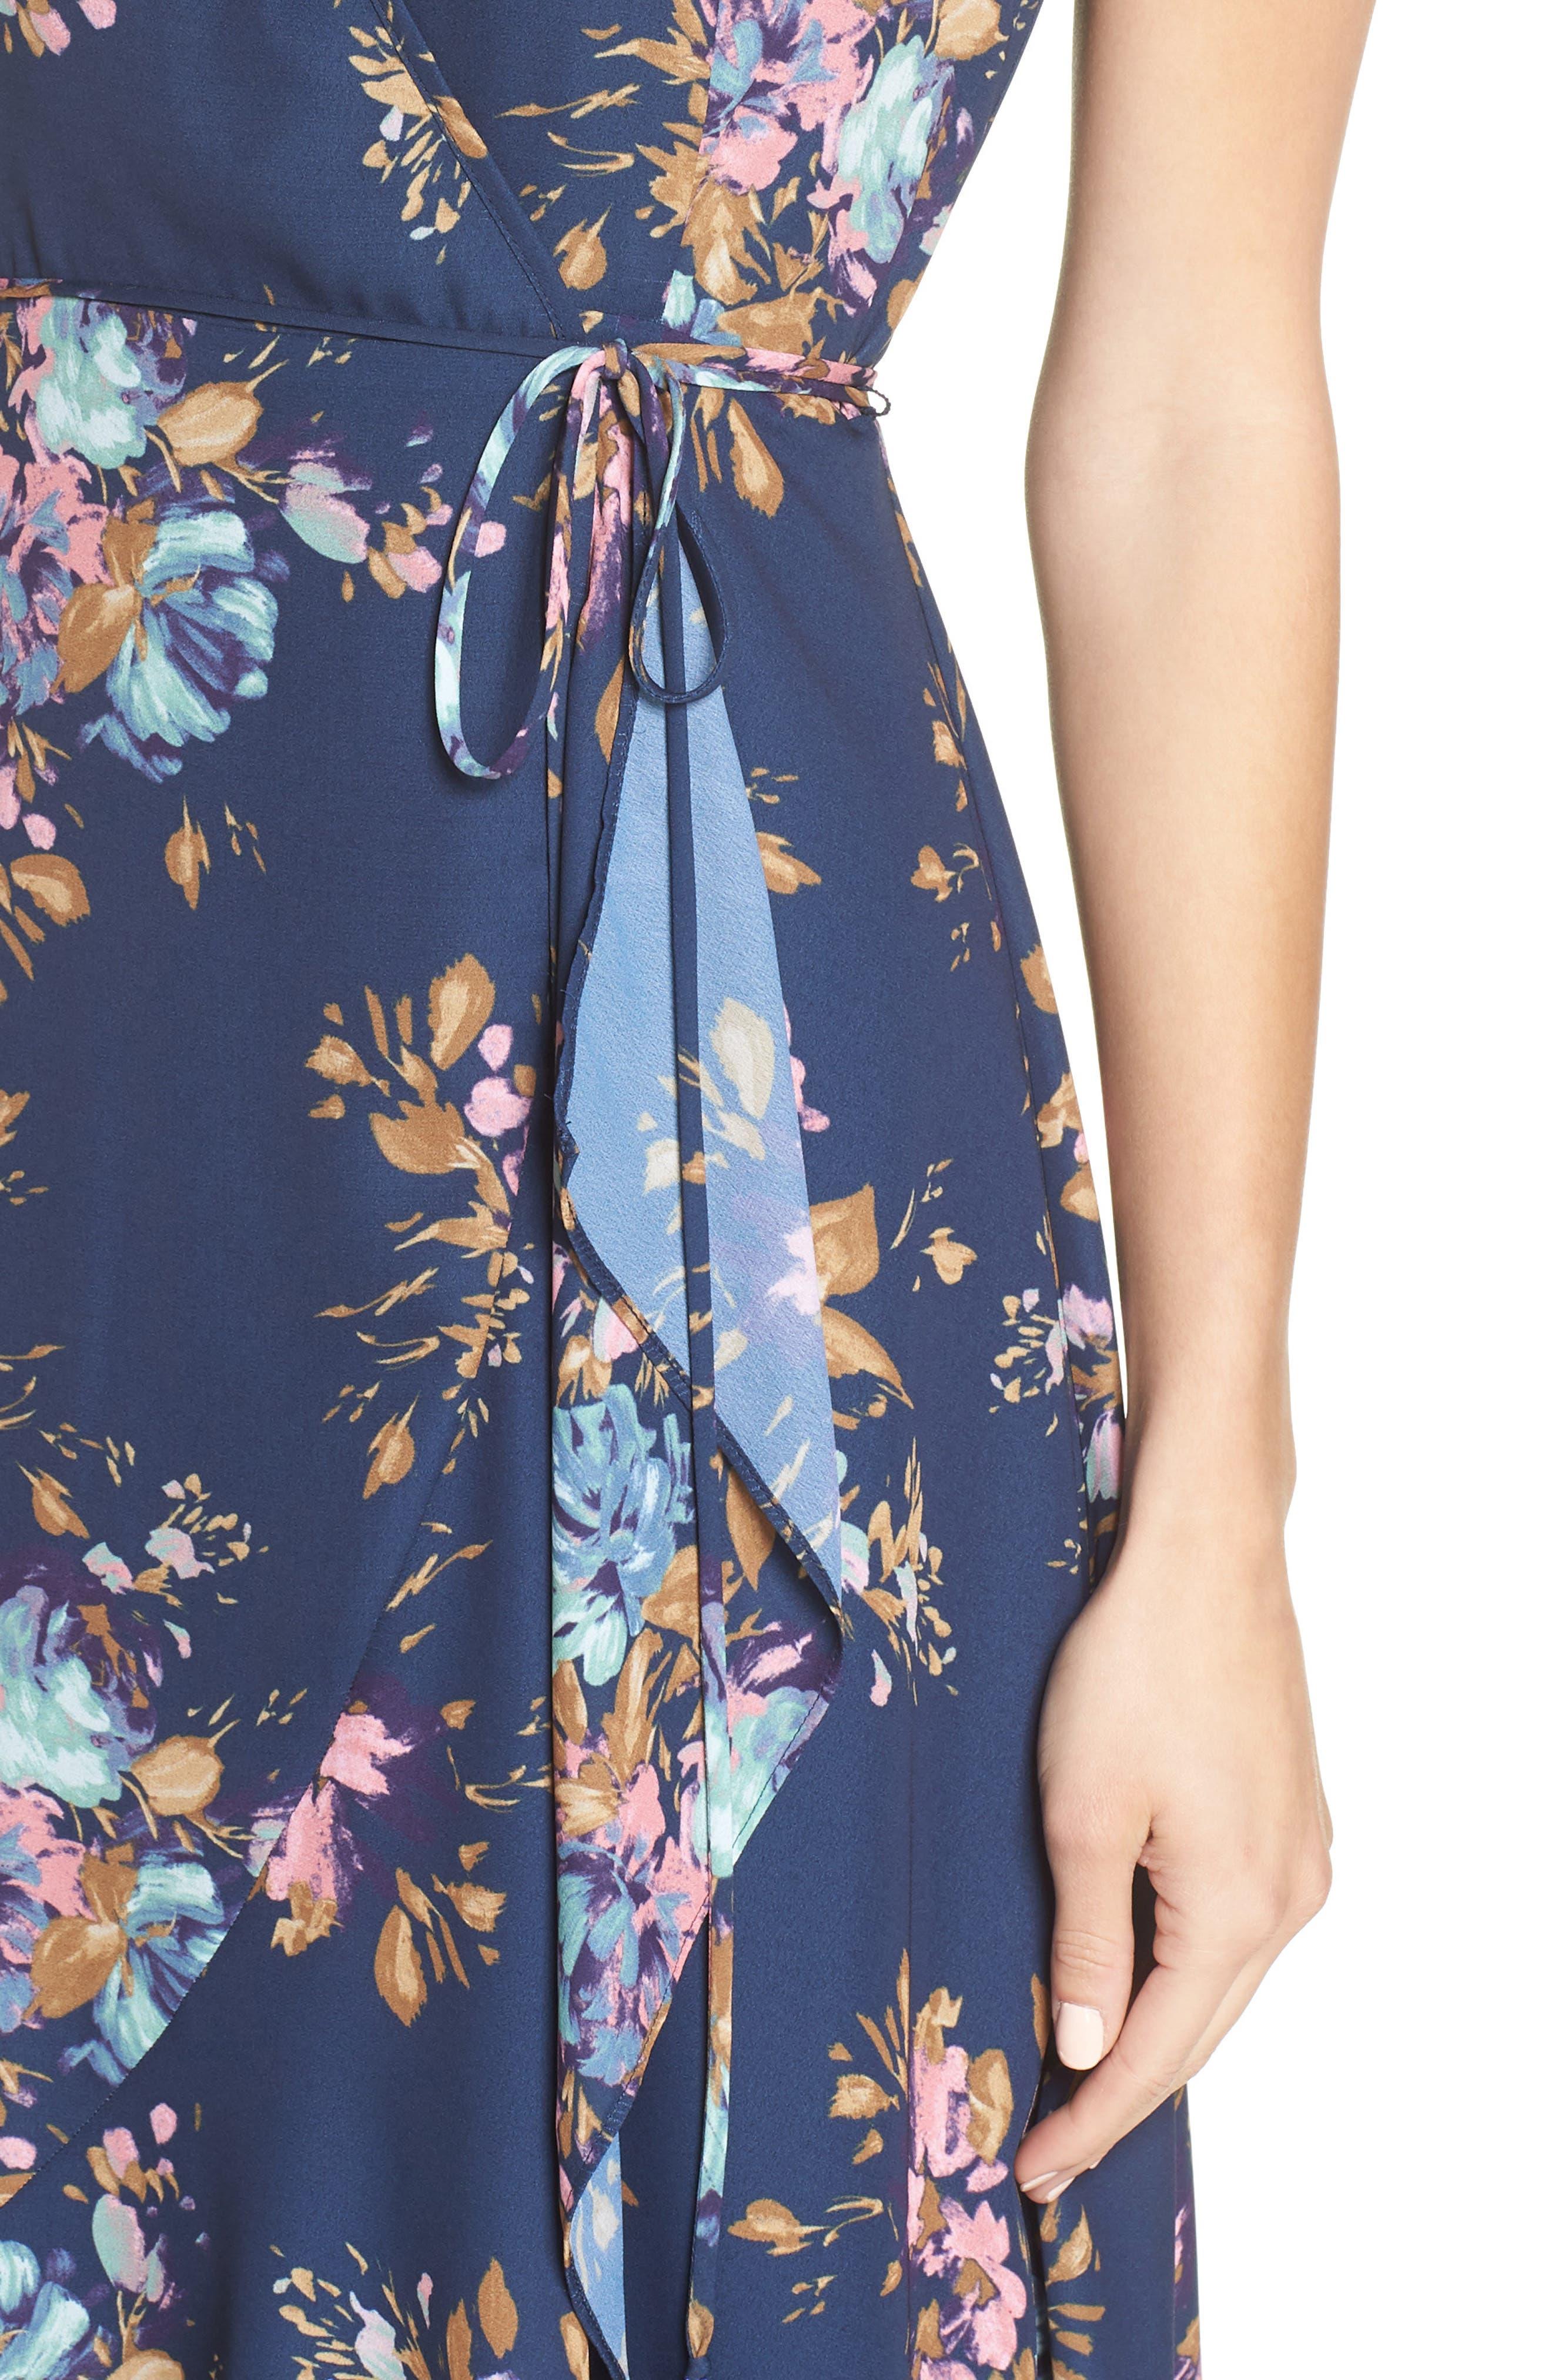 Floral Sleeveless Wrap Dress,                             Alternate thumbnail 4, color,                             Navy Floral